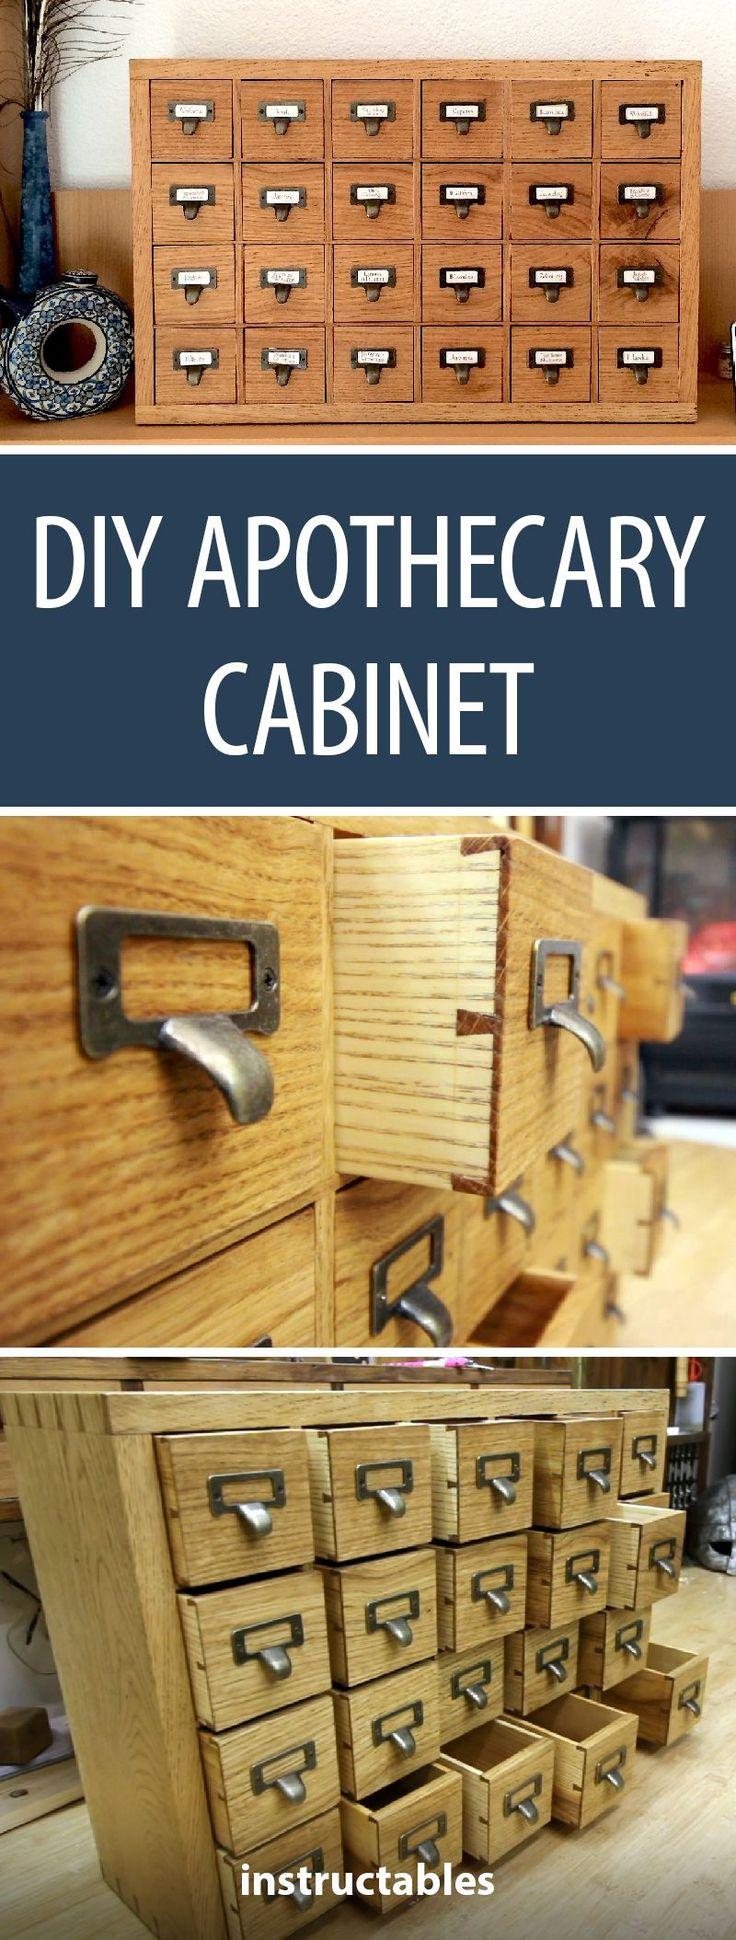 DIY Apothecary Cabinet  #woodworking #storage #organization